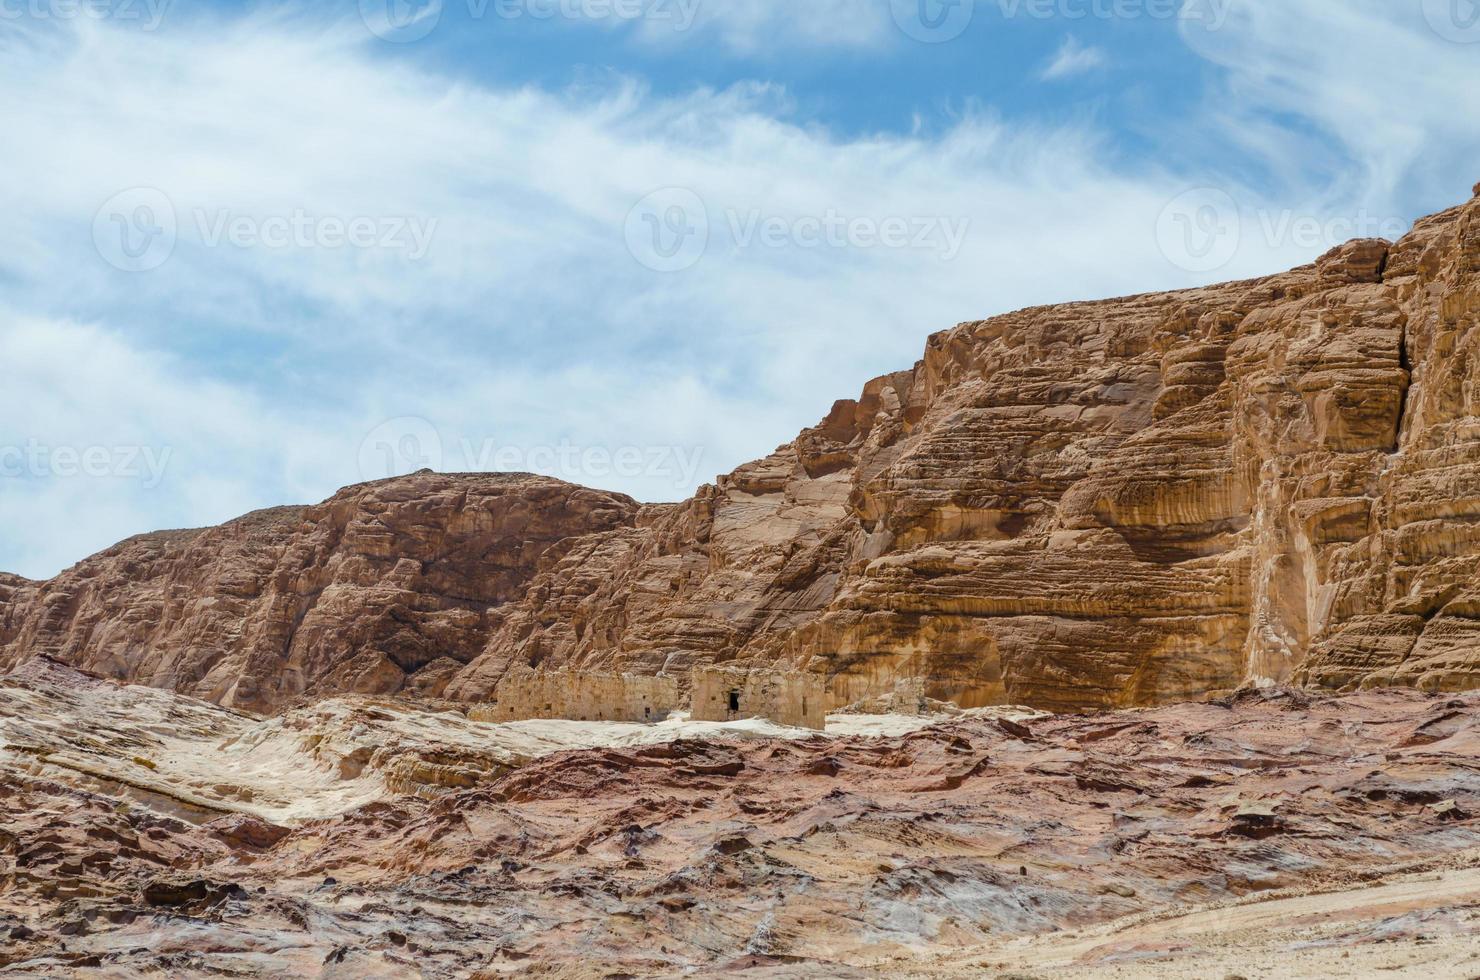 hoge rotsachtige bergen en blauwe lucht met witte wolken foto